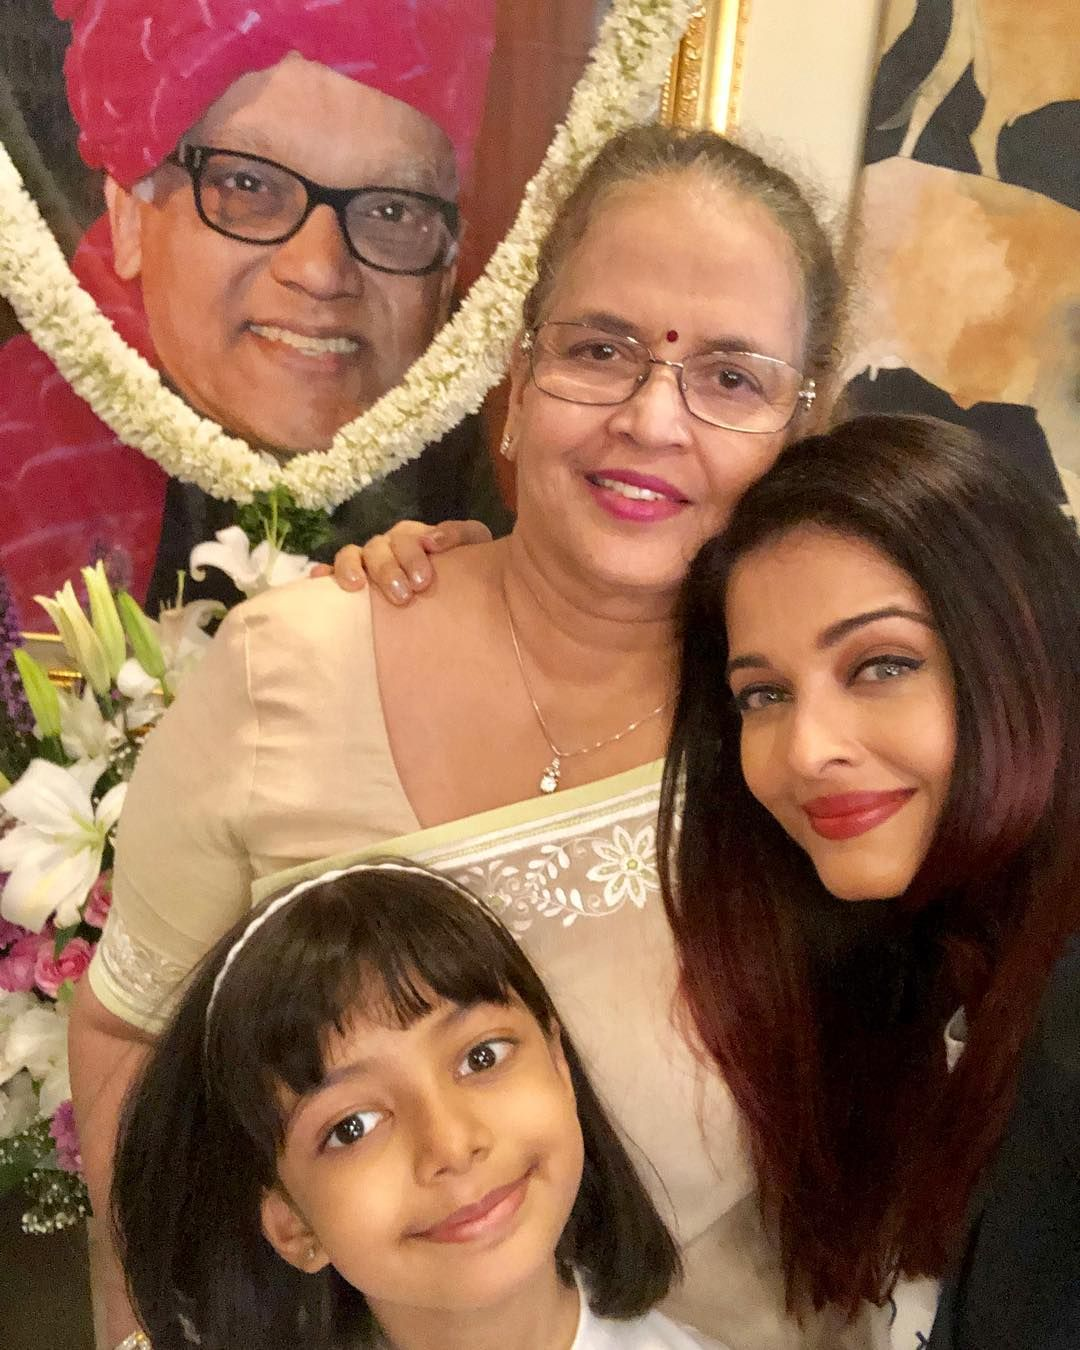 Aishwarya Rai Remembers Father Krishnaraj Rai On His Birth Anniversary In The Sweetest Way Possible Hungryboo Aishwarya Rai Bollywood Actress Remembering Father